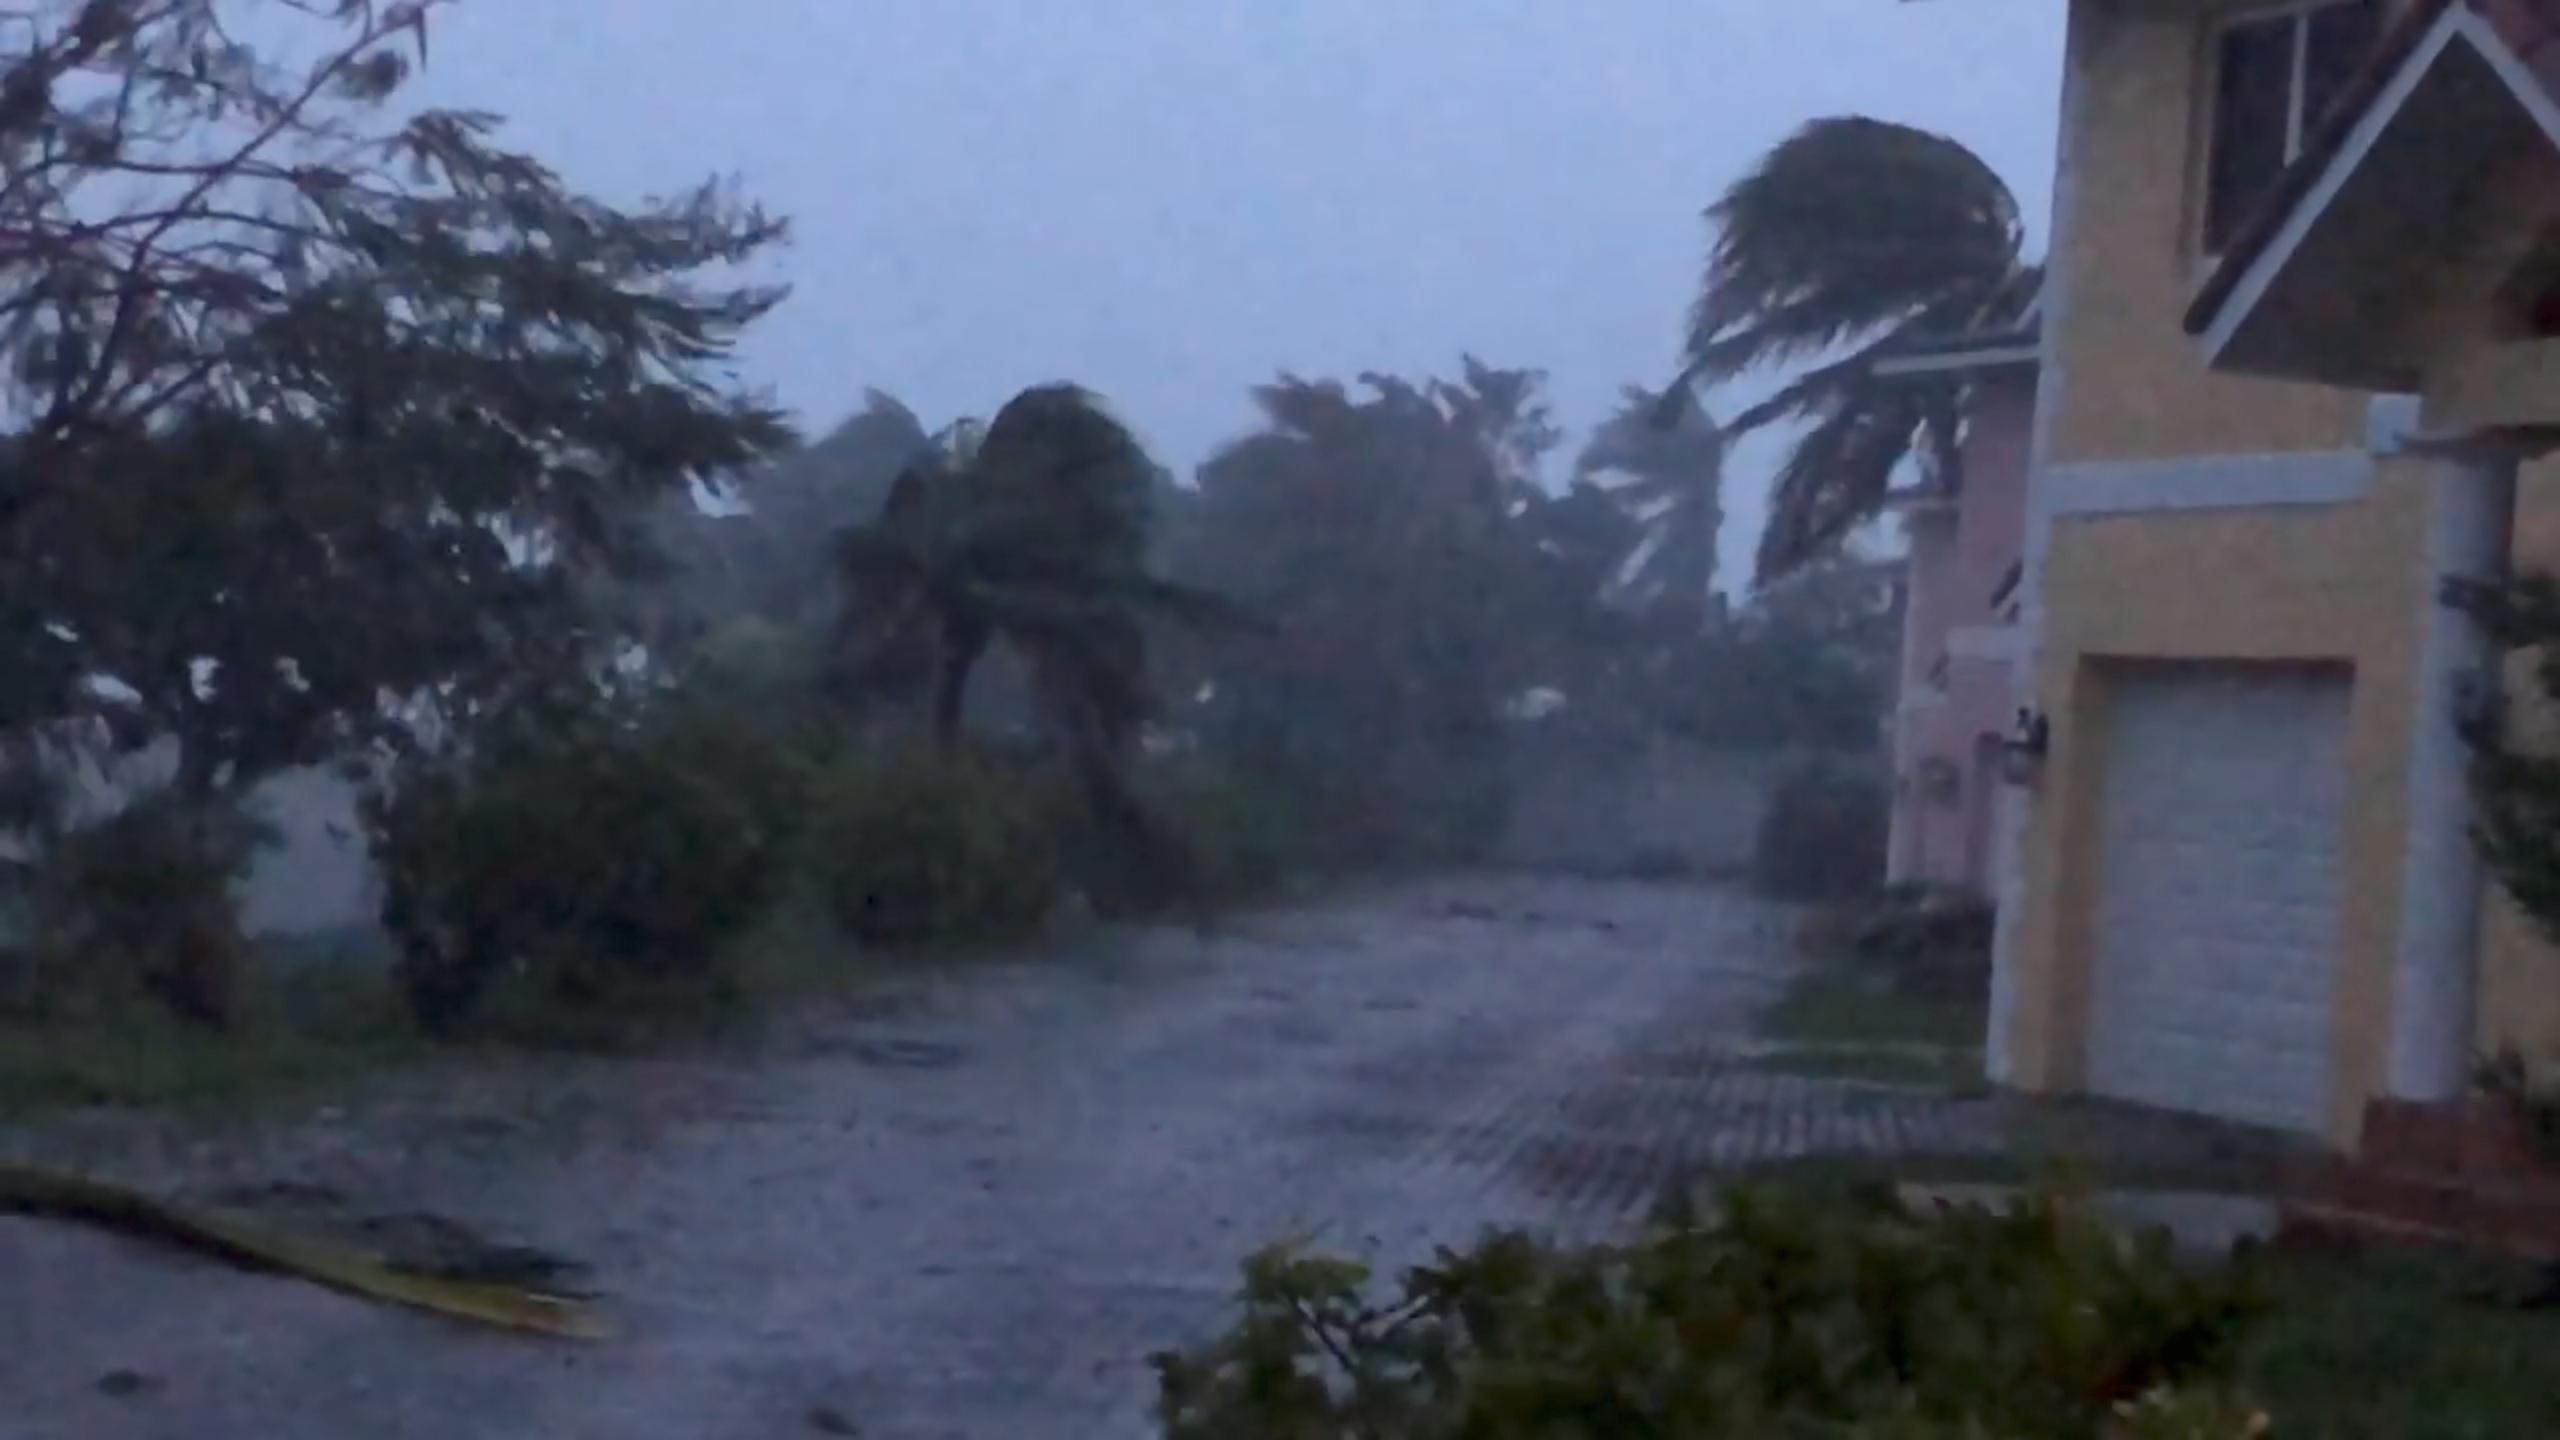 Strong winds batter Oceanhill Boulevard in Freeport, Grand Bahama Island on Sept. 2.